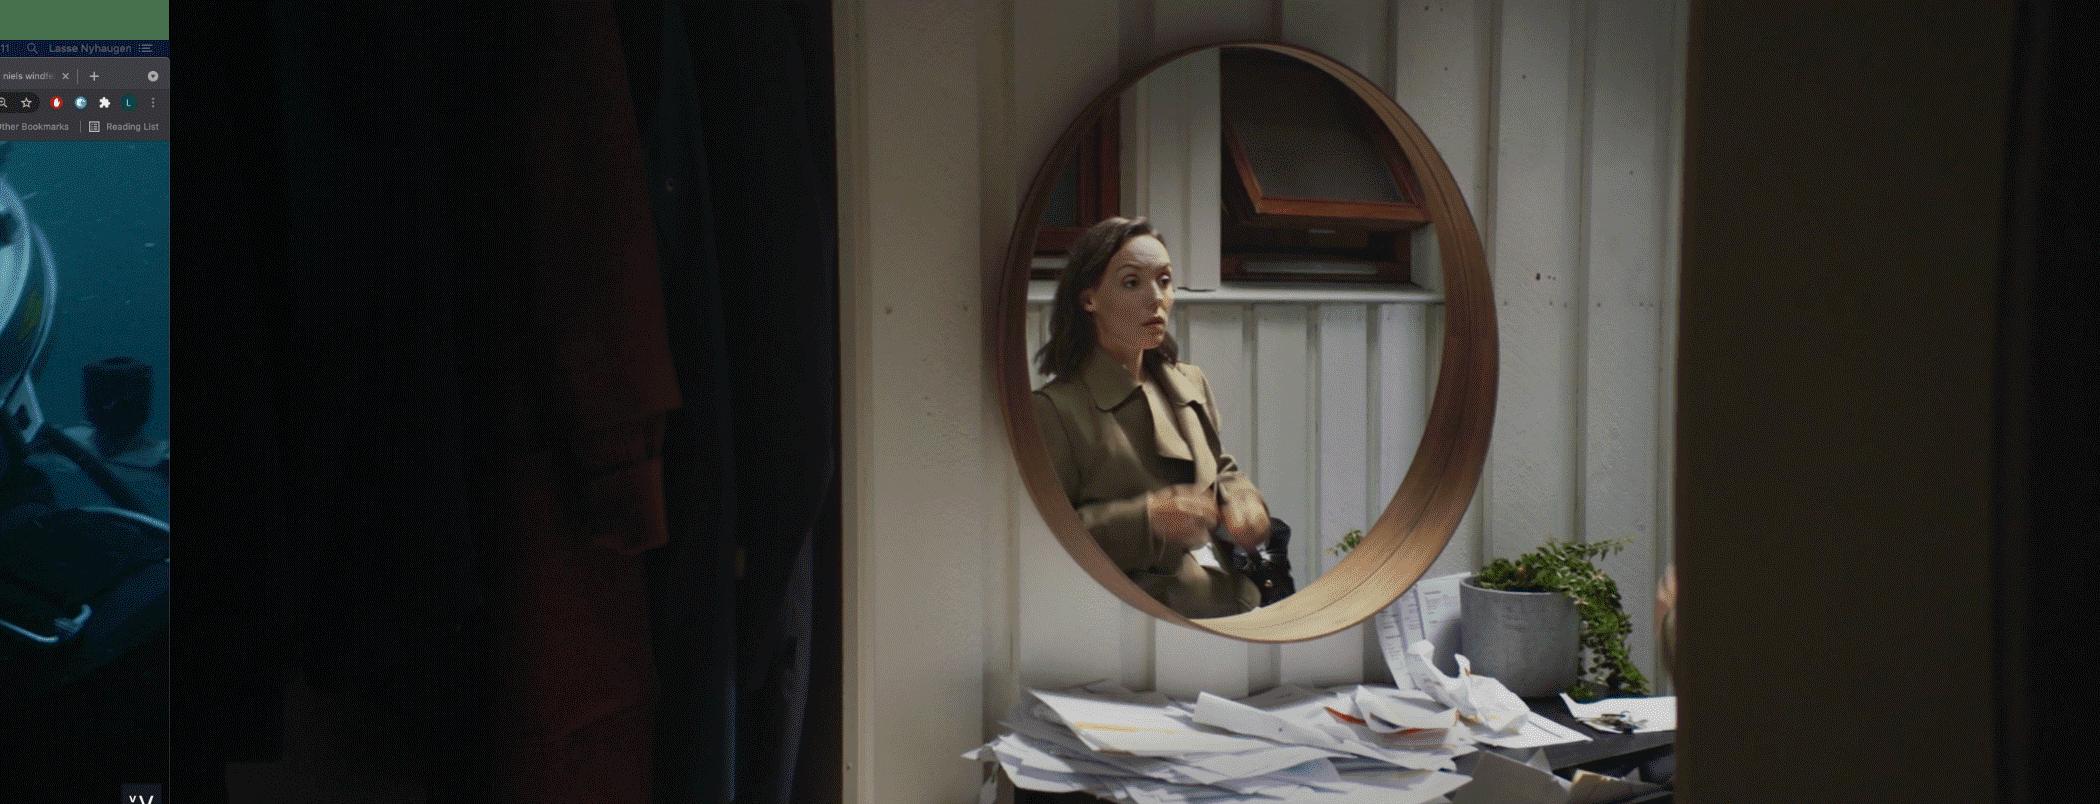 Mirror, Window, Wood